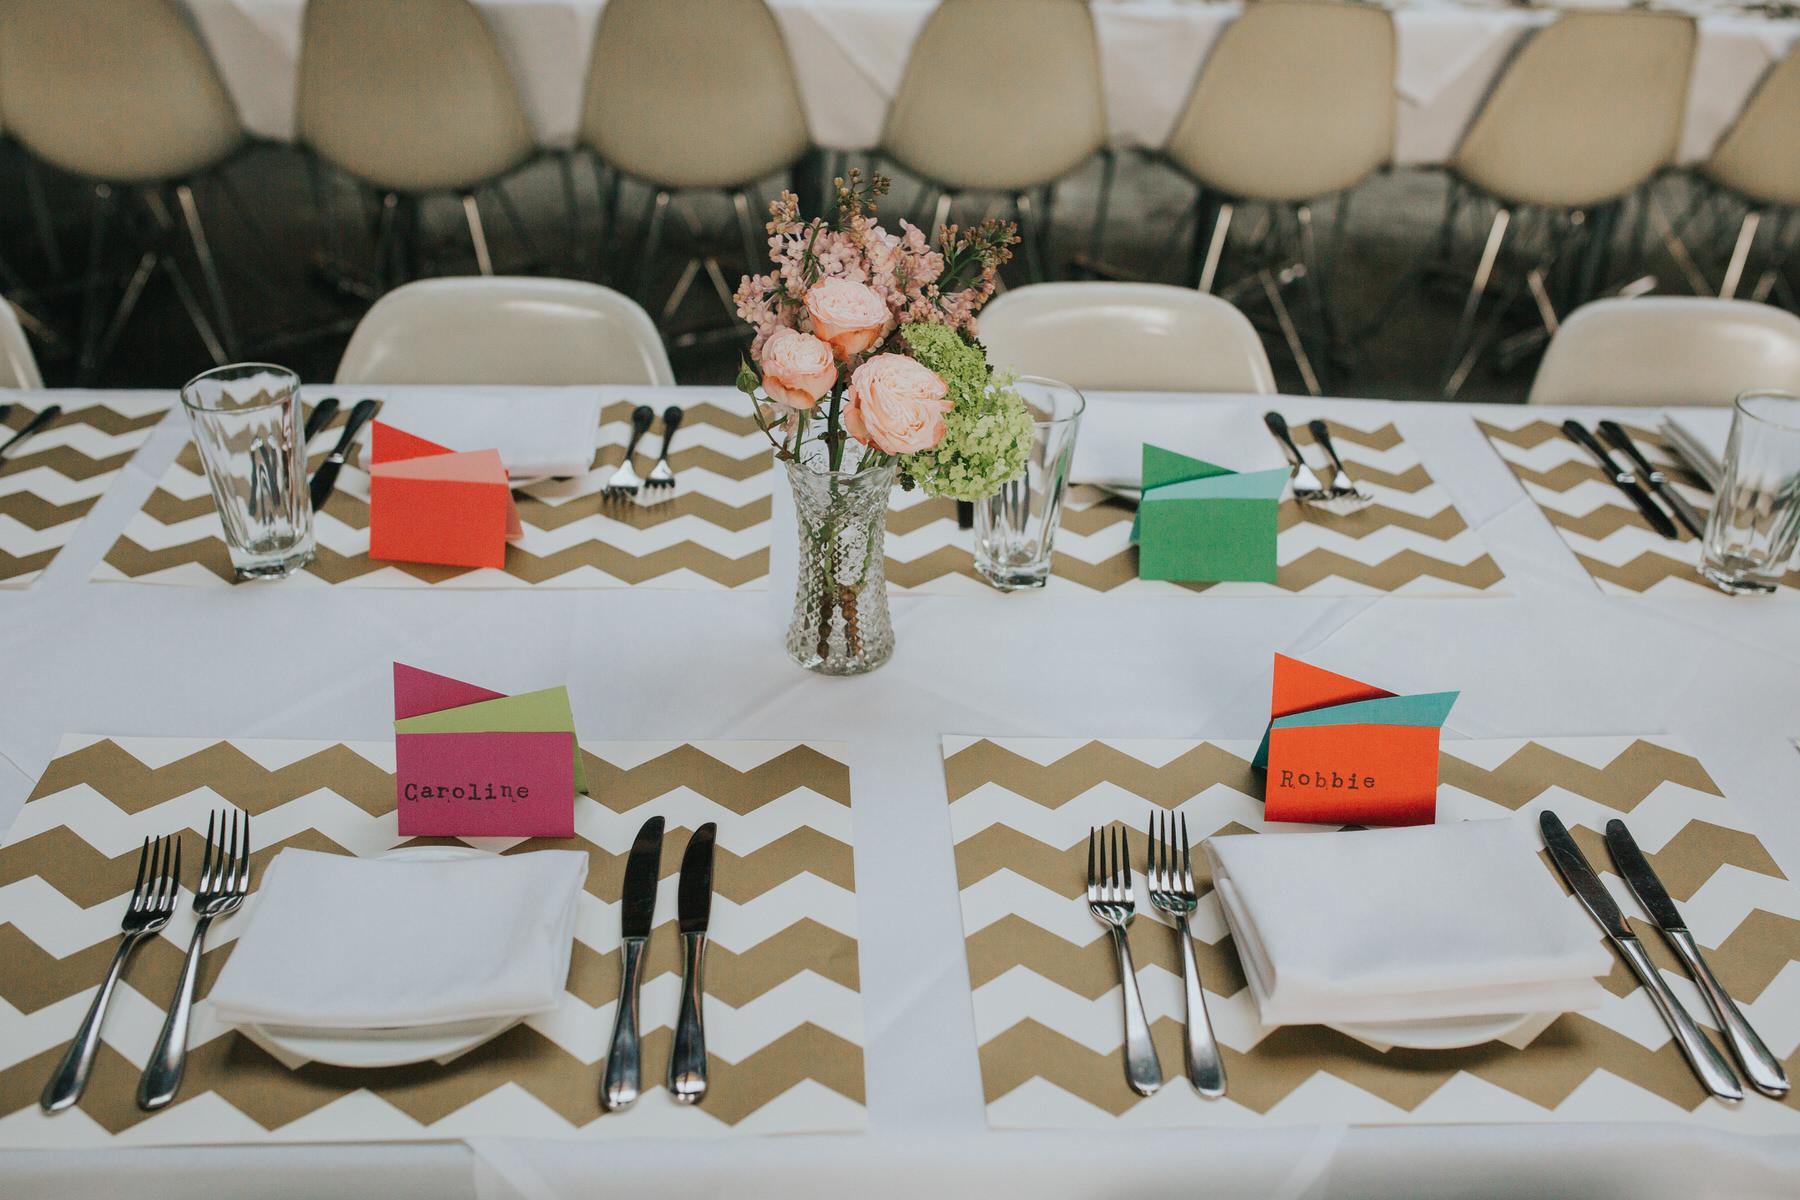 21-St Chads Place wedding gold chevron table mulit colour geometric place names.jpg